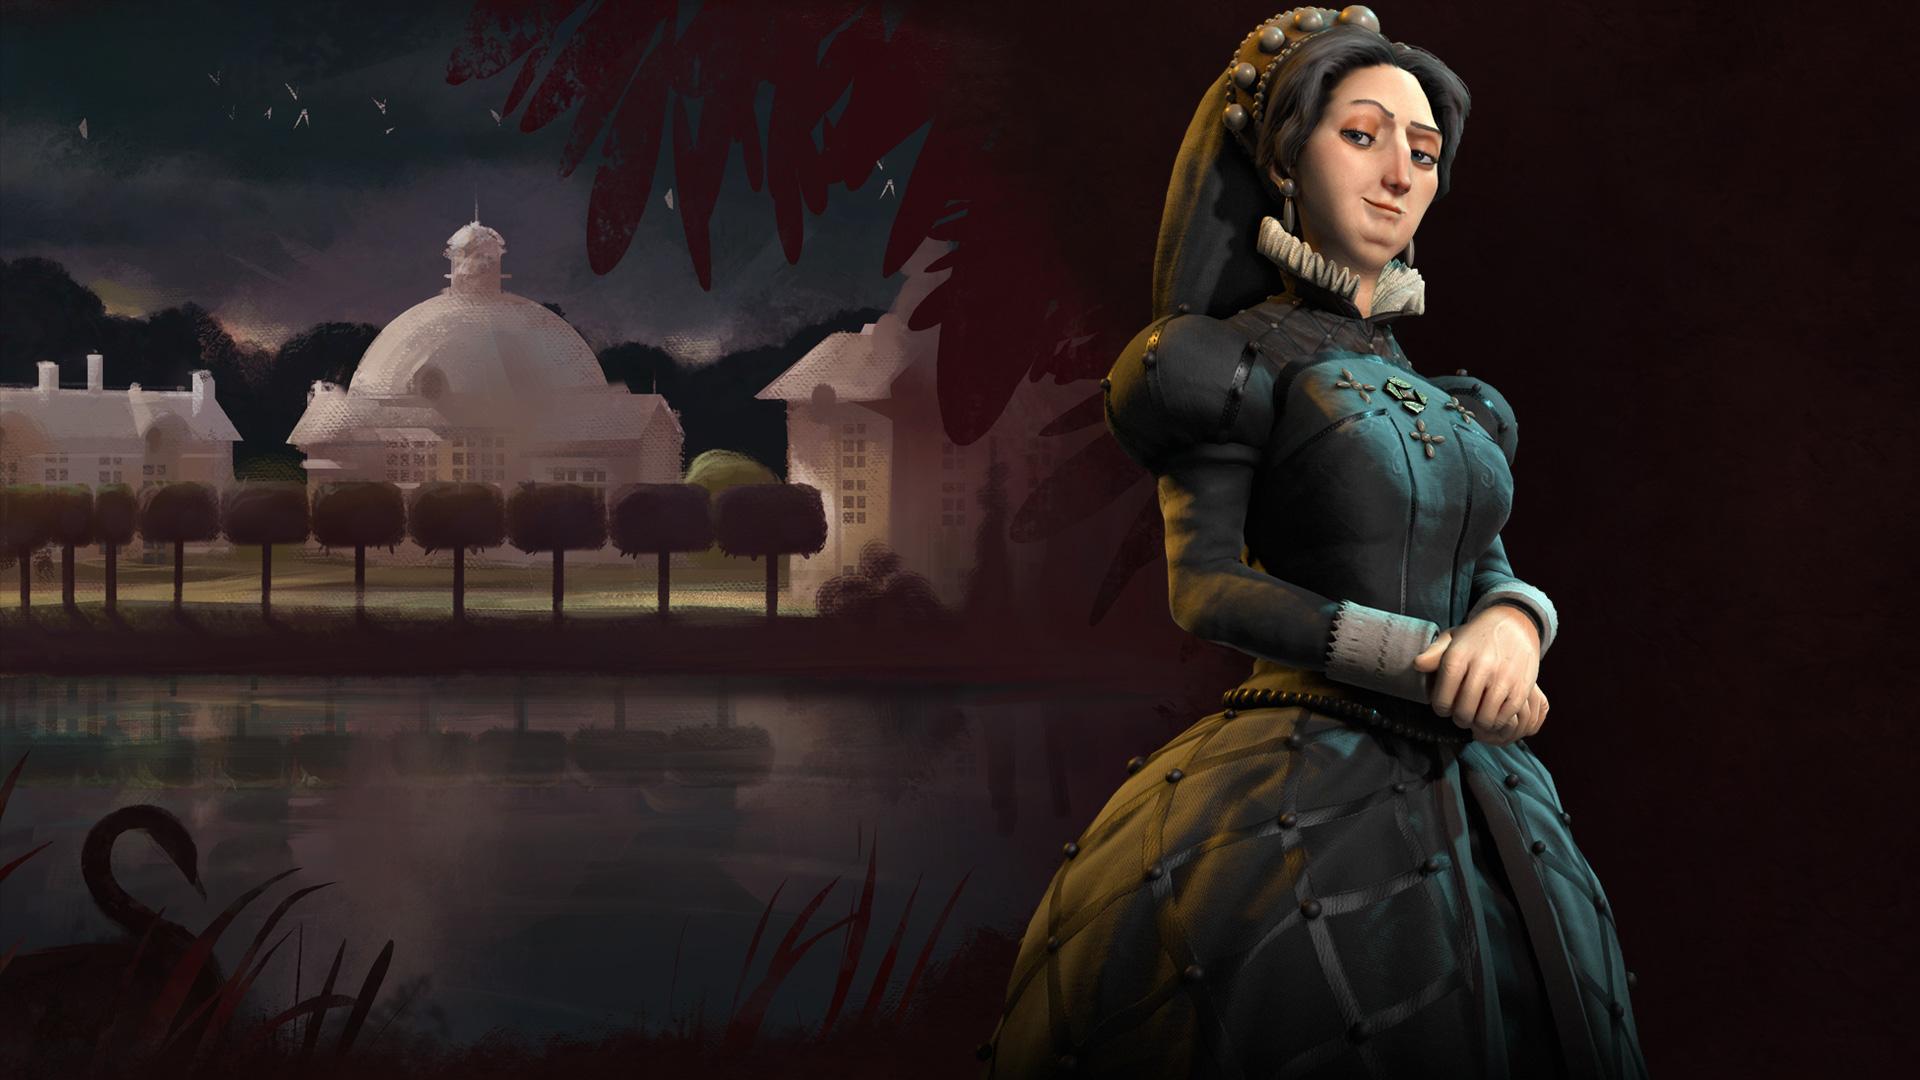 Catherine de Medici in Civ 6